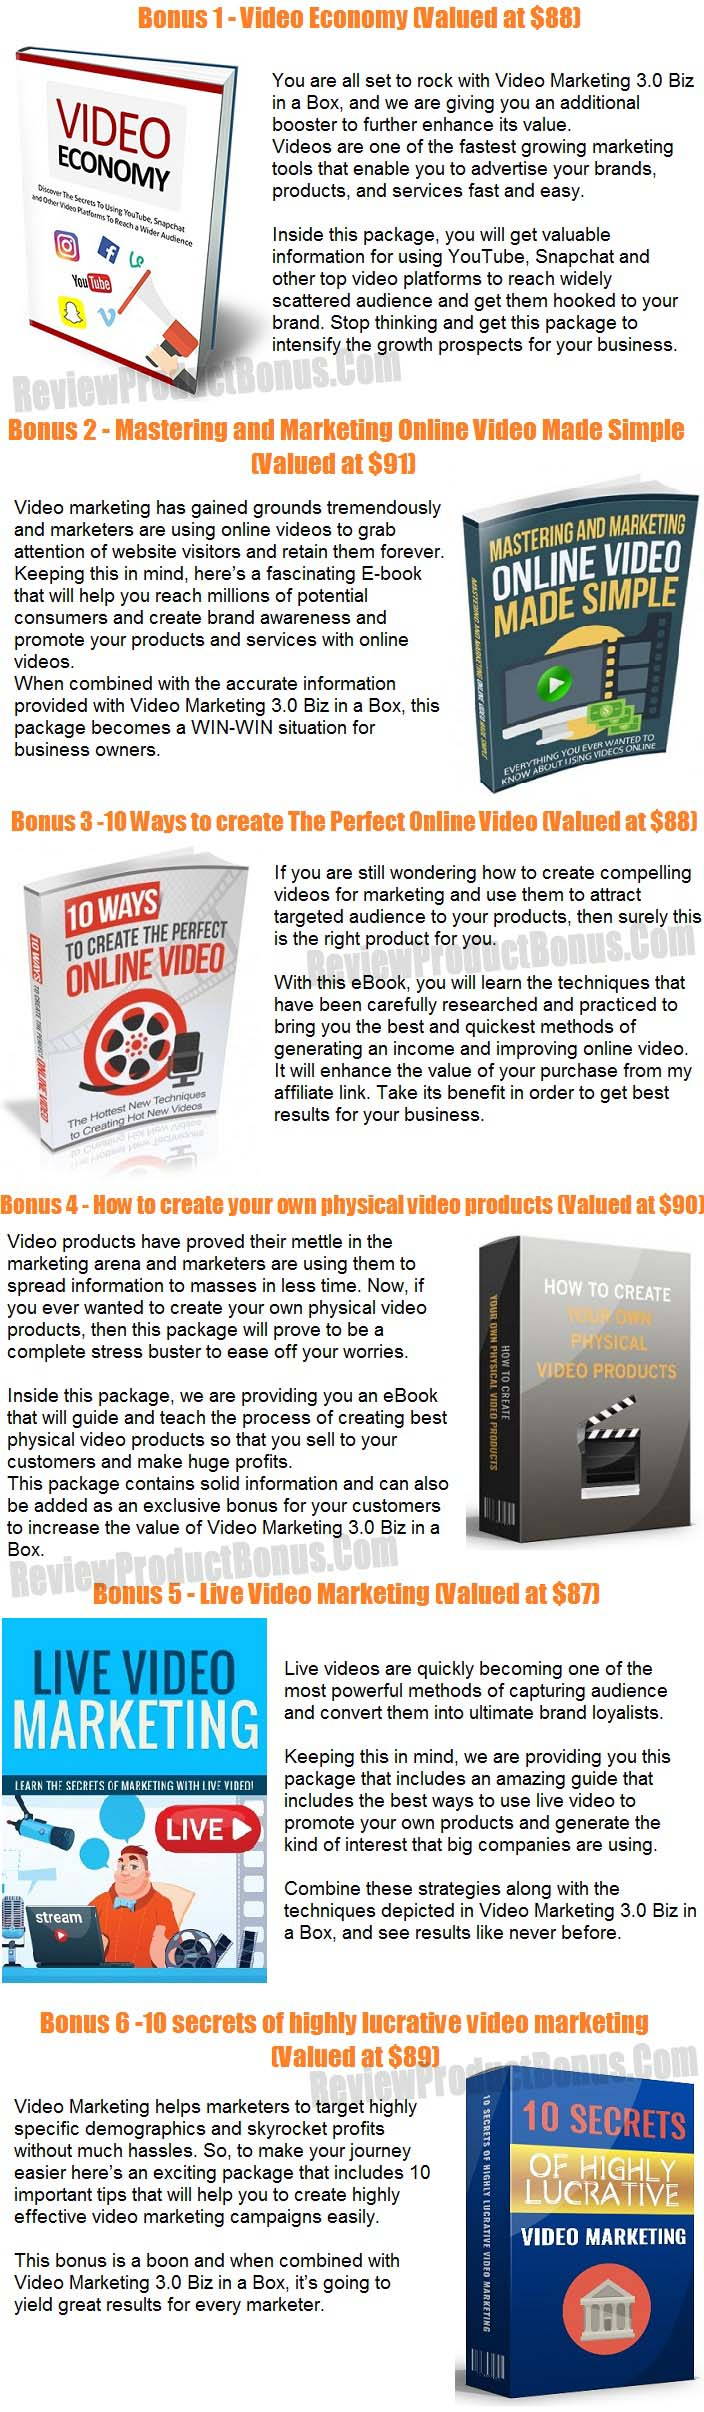 Video Marketing 3.0 Bonus